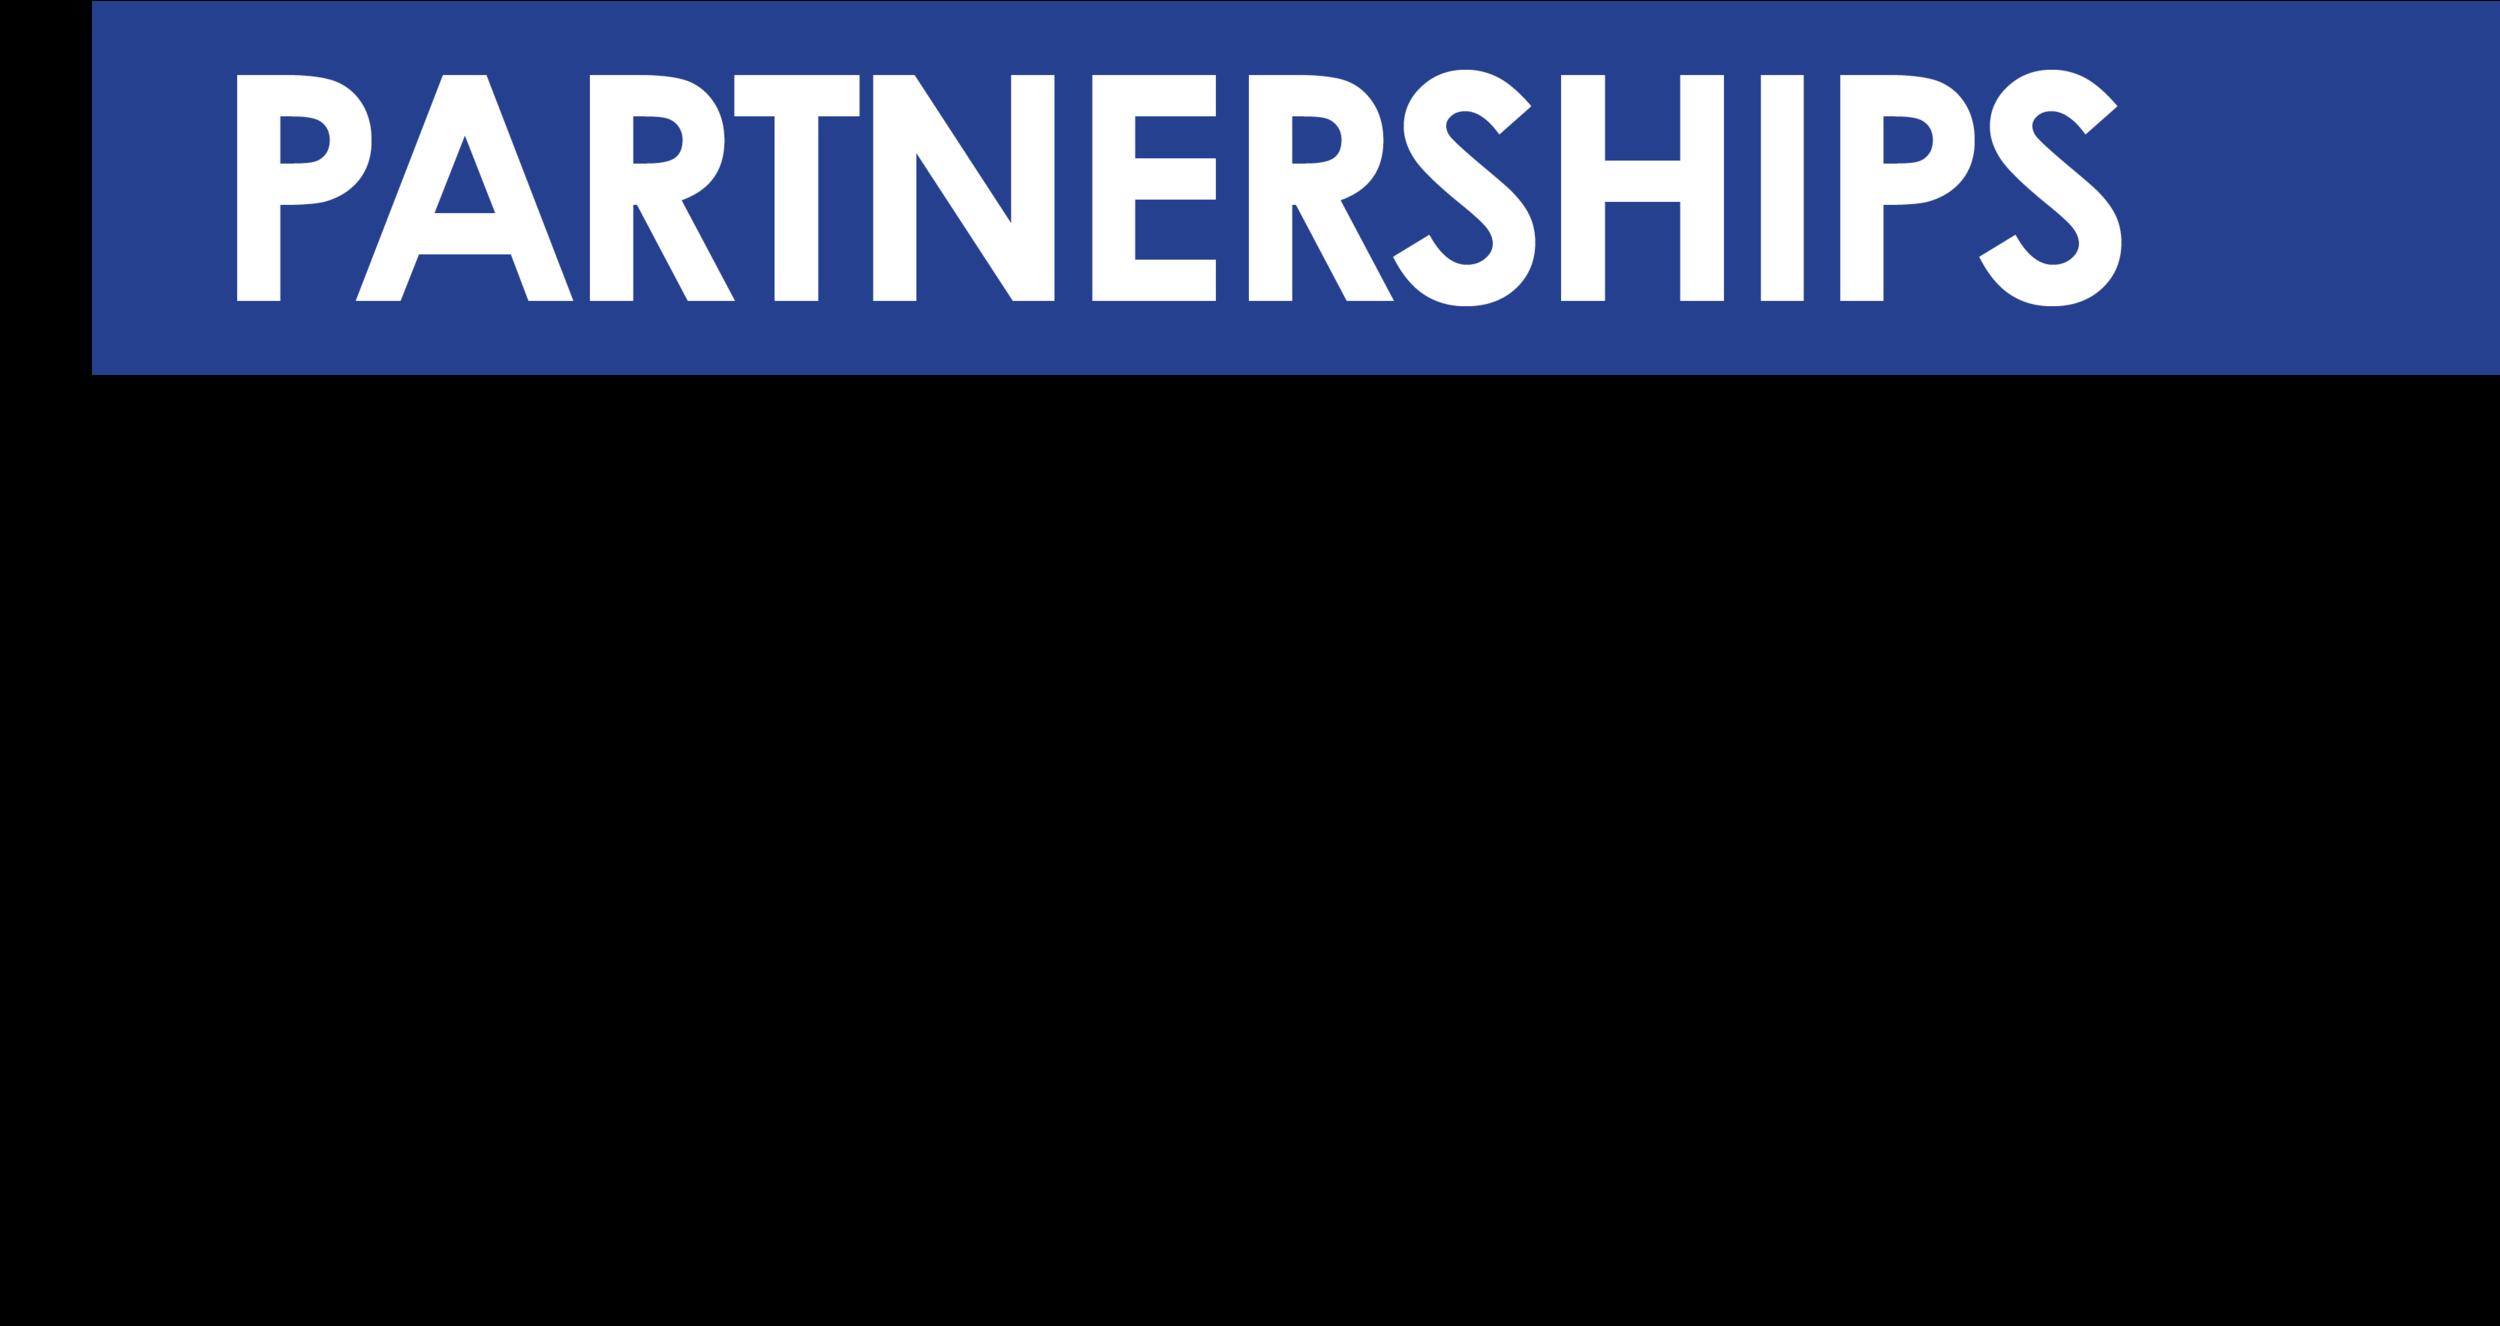 St Nicholas Pathways Partnerships